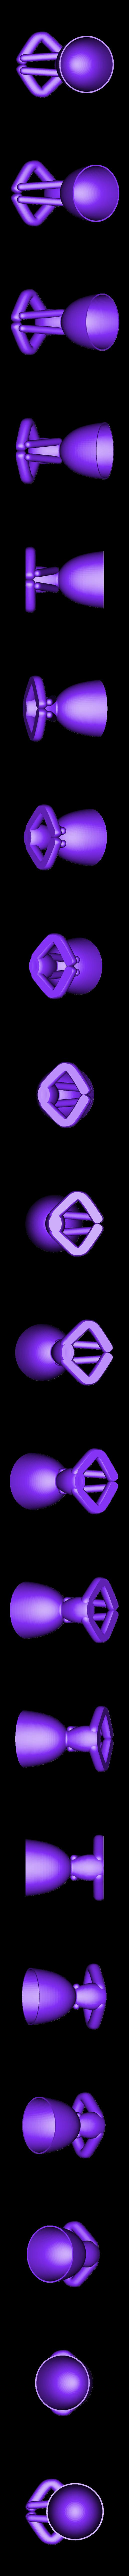 Vaso_12_Yoga estirando.stl Télécharger fichier STL gratuit JARRÓN MACETA ROBERT 12 - VASE POT DE FLEURS ROBERT 12 • Plan pour imprimante 3D, CREATIONSISHI